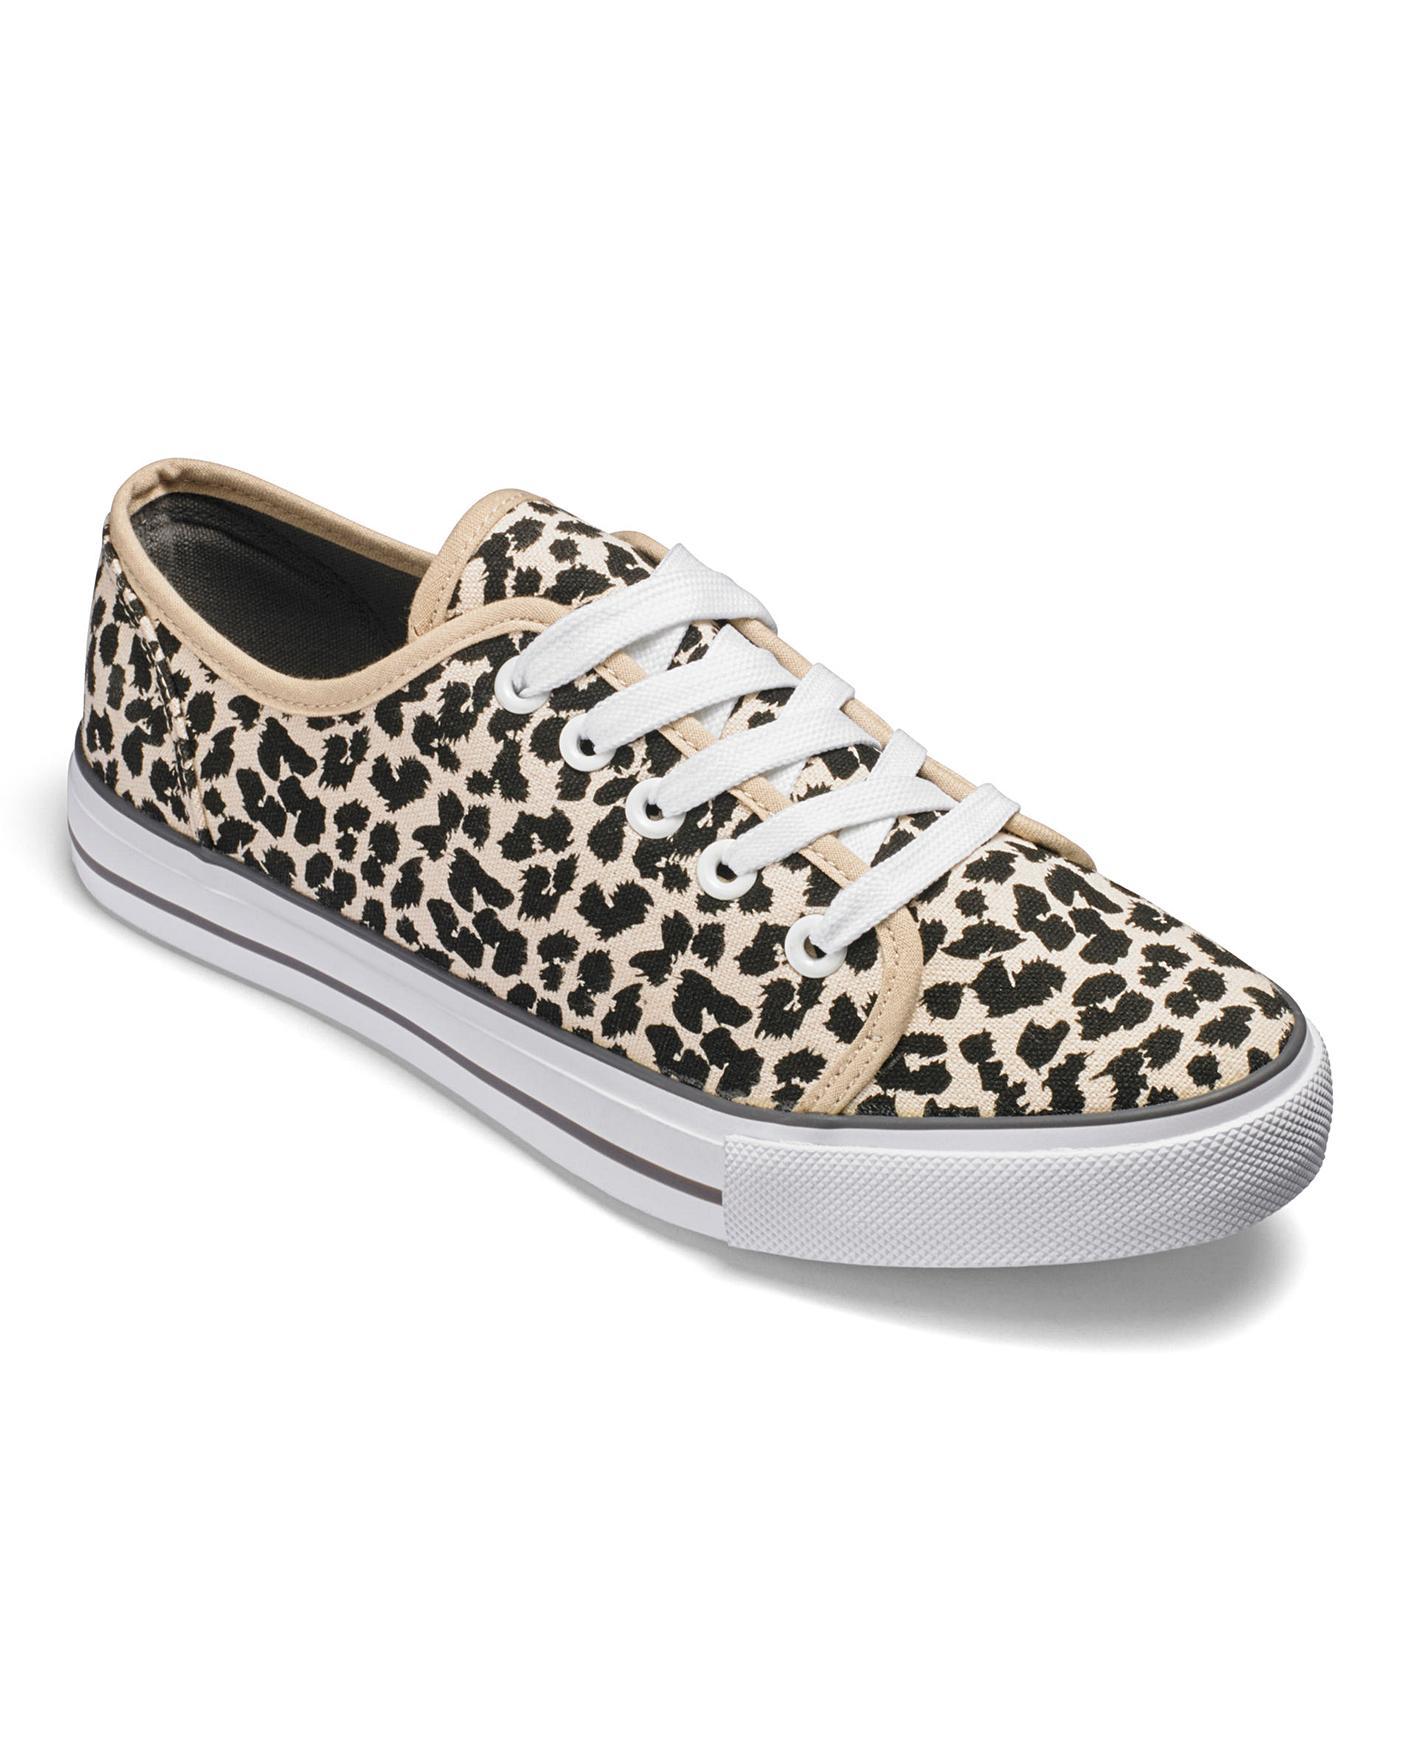 Dunlop Canvas Lace Up Shoes EEE Fit